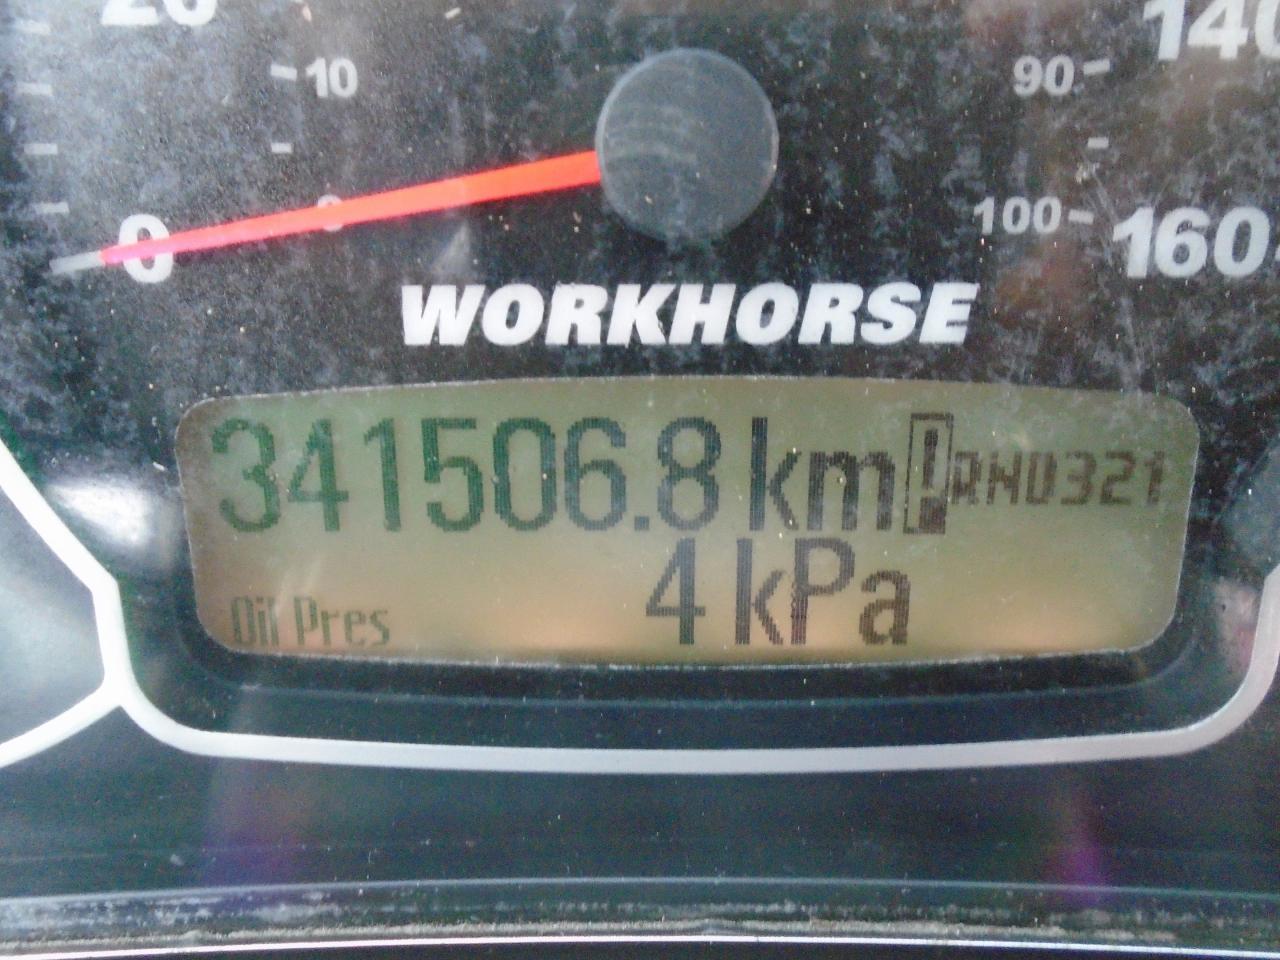 2007 Workhorse P42